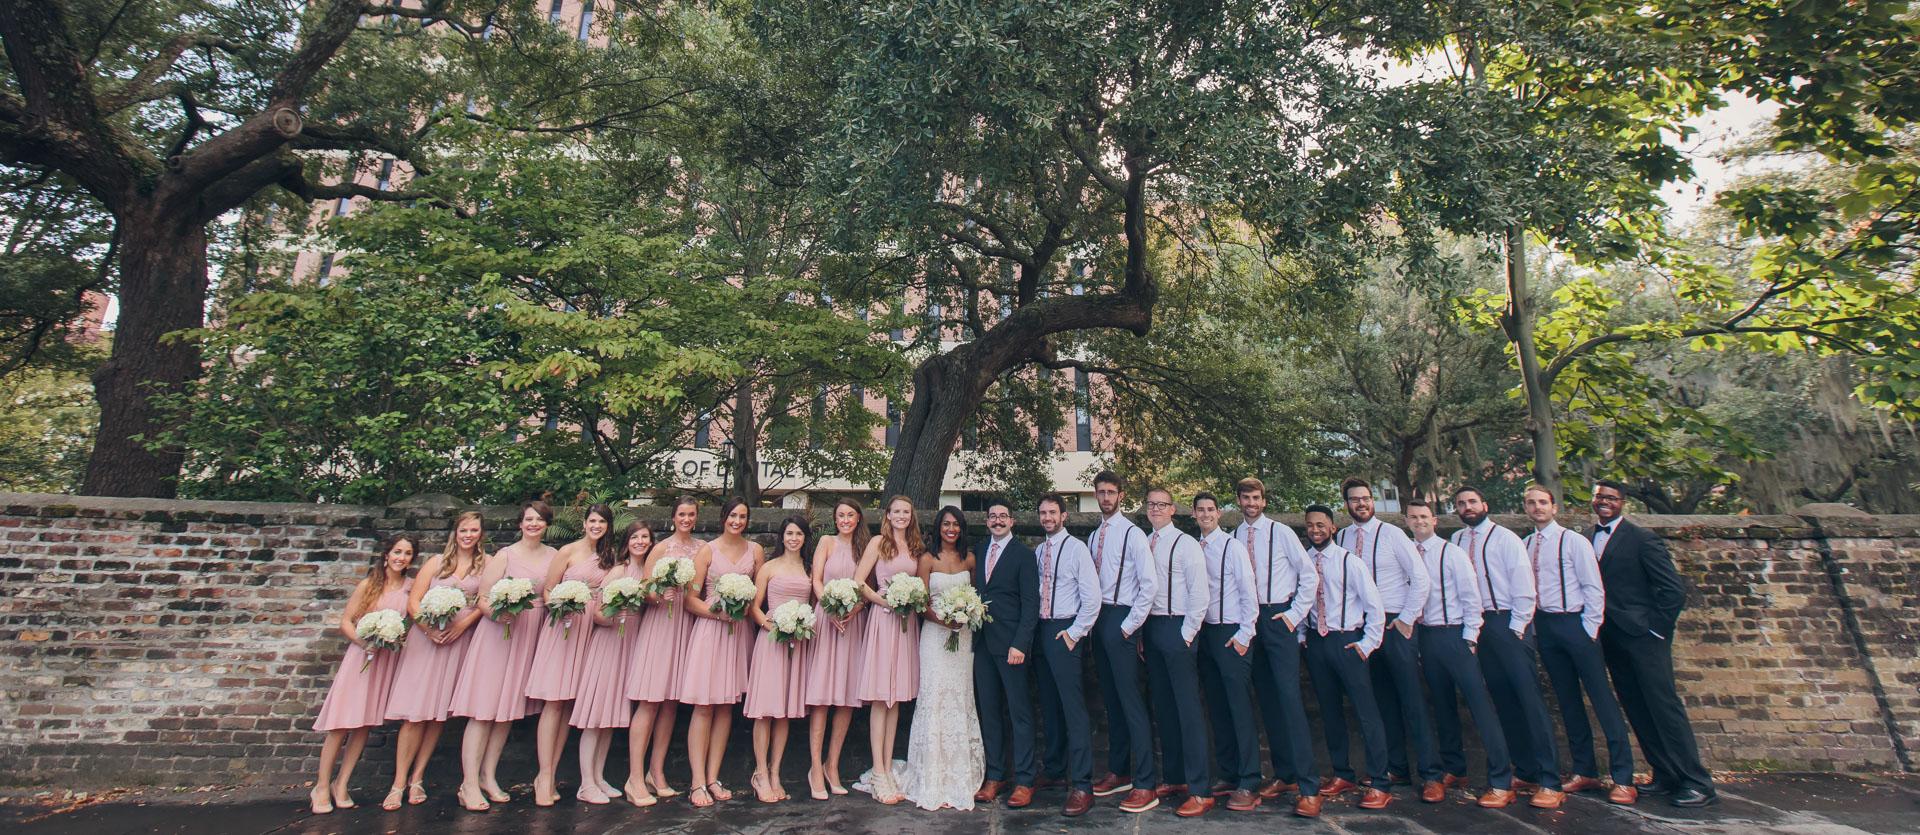 davis-wedding-party